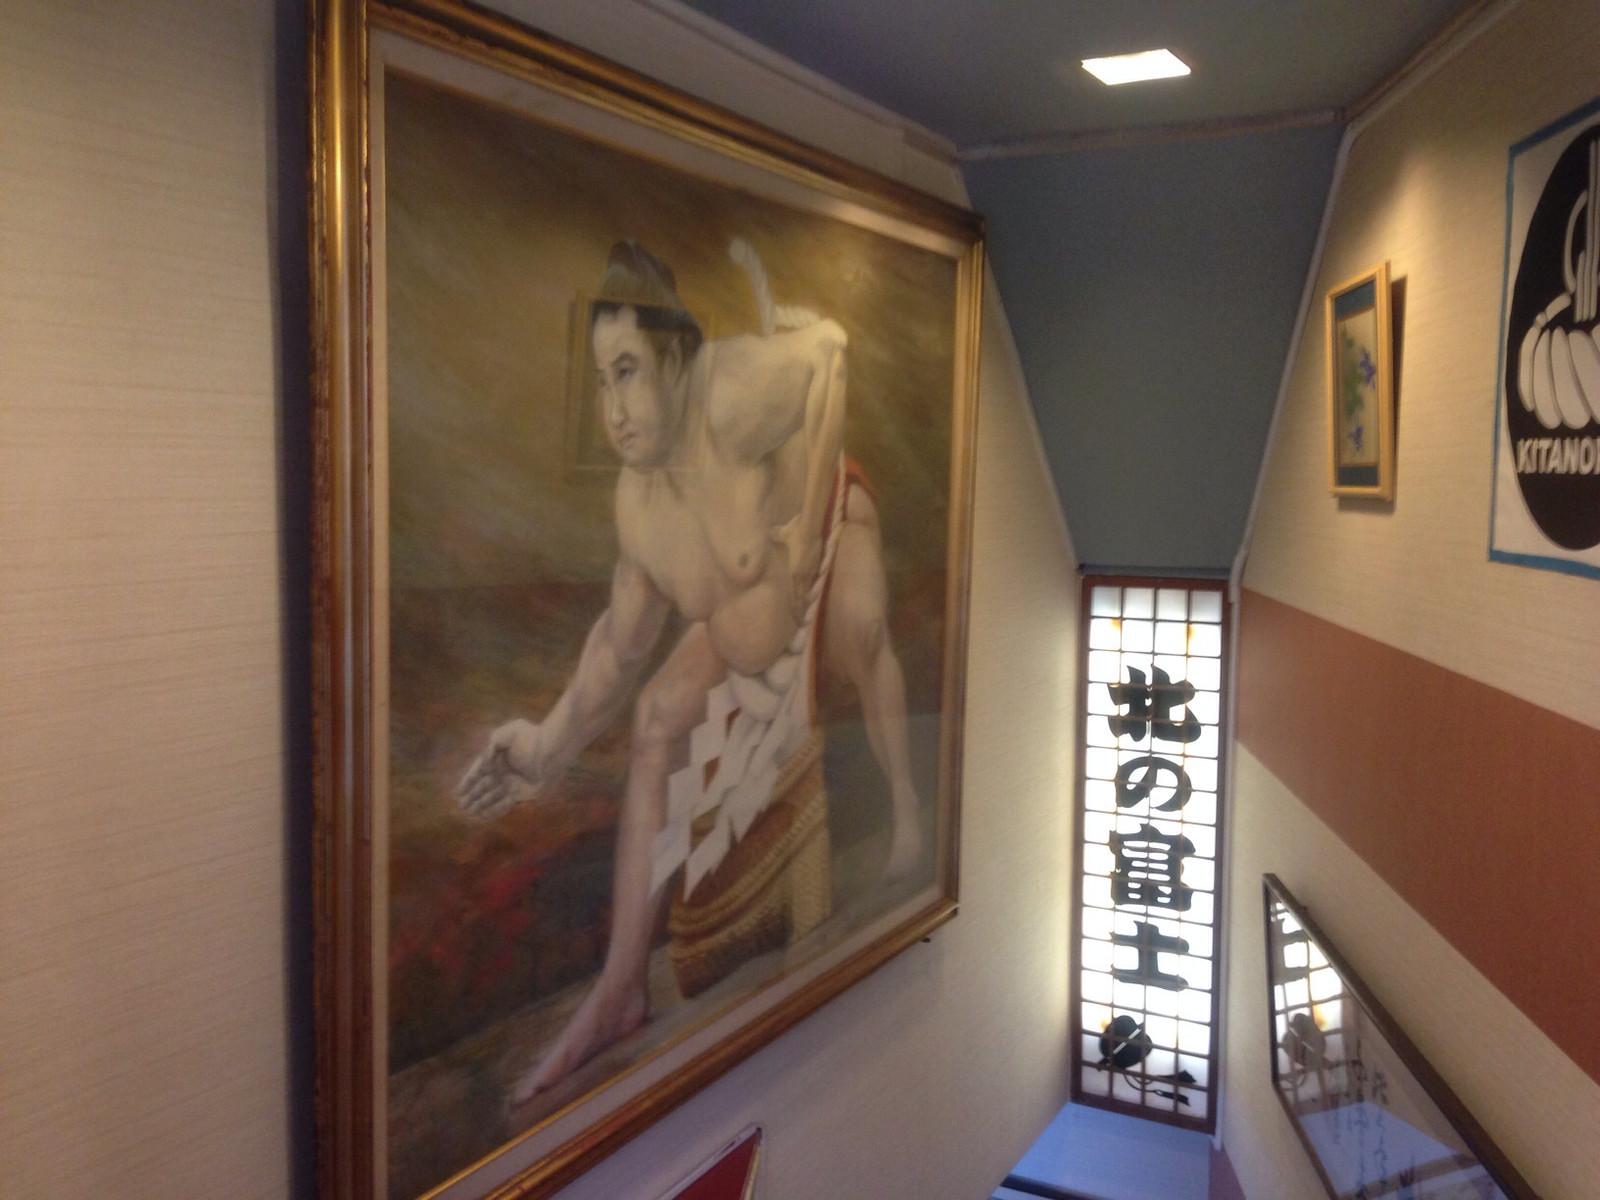 Image 雲竜型の土俵入りをする横綱の絵画。 まさに絵になる男、角界のダンディズ... 北脇、